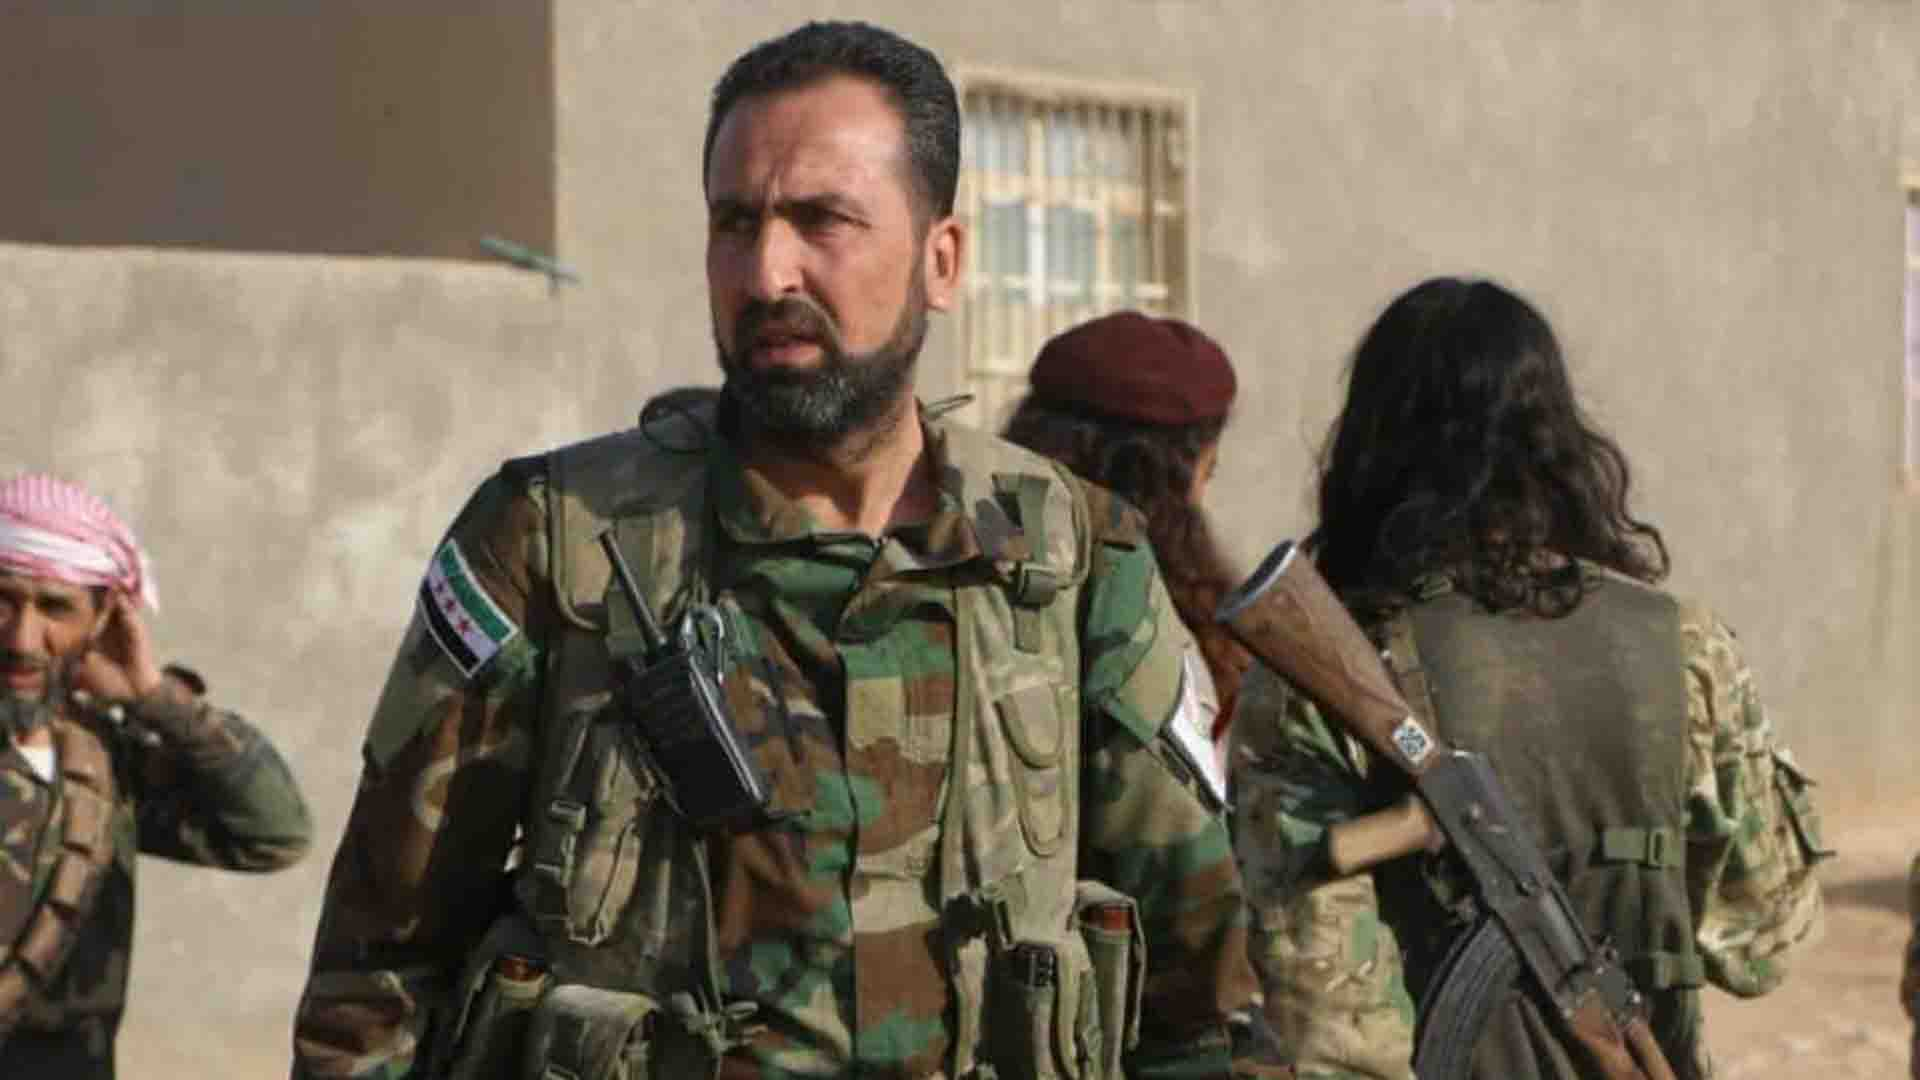 Leader in Turkish-backed Hamzat group